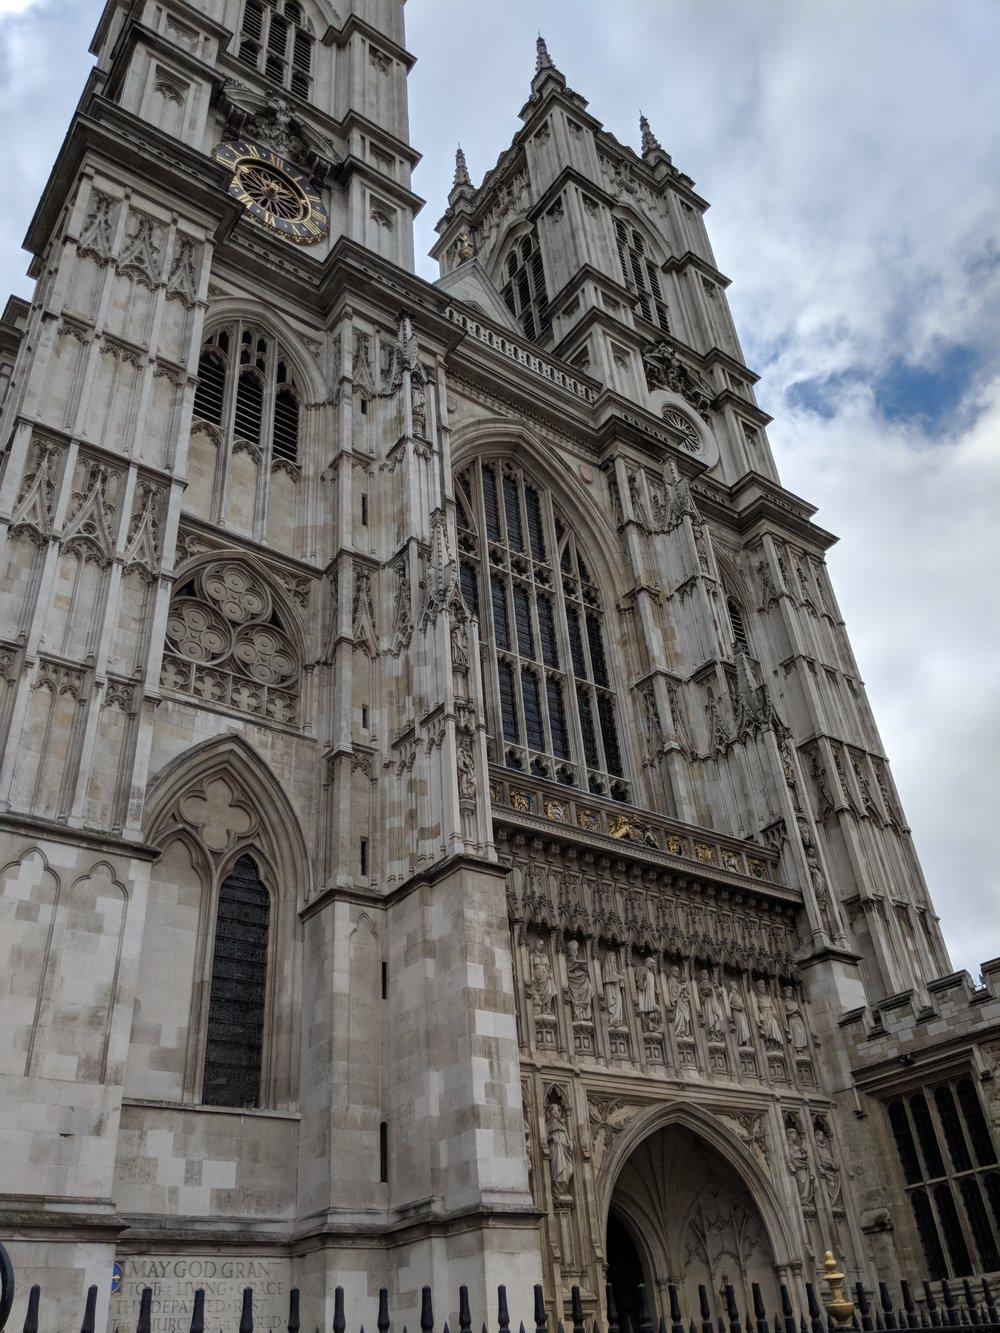 Westminster Abbey. Photo courtesy of Sara Fontes